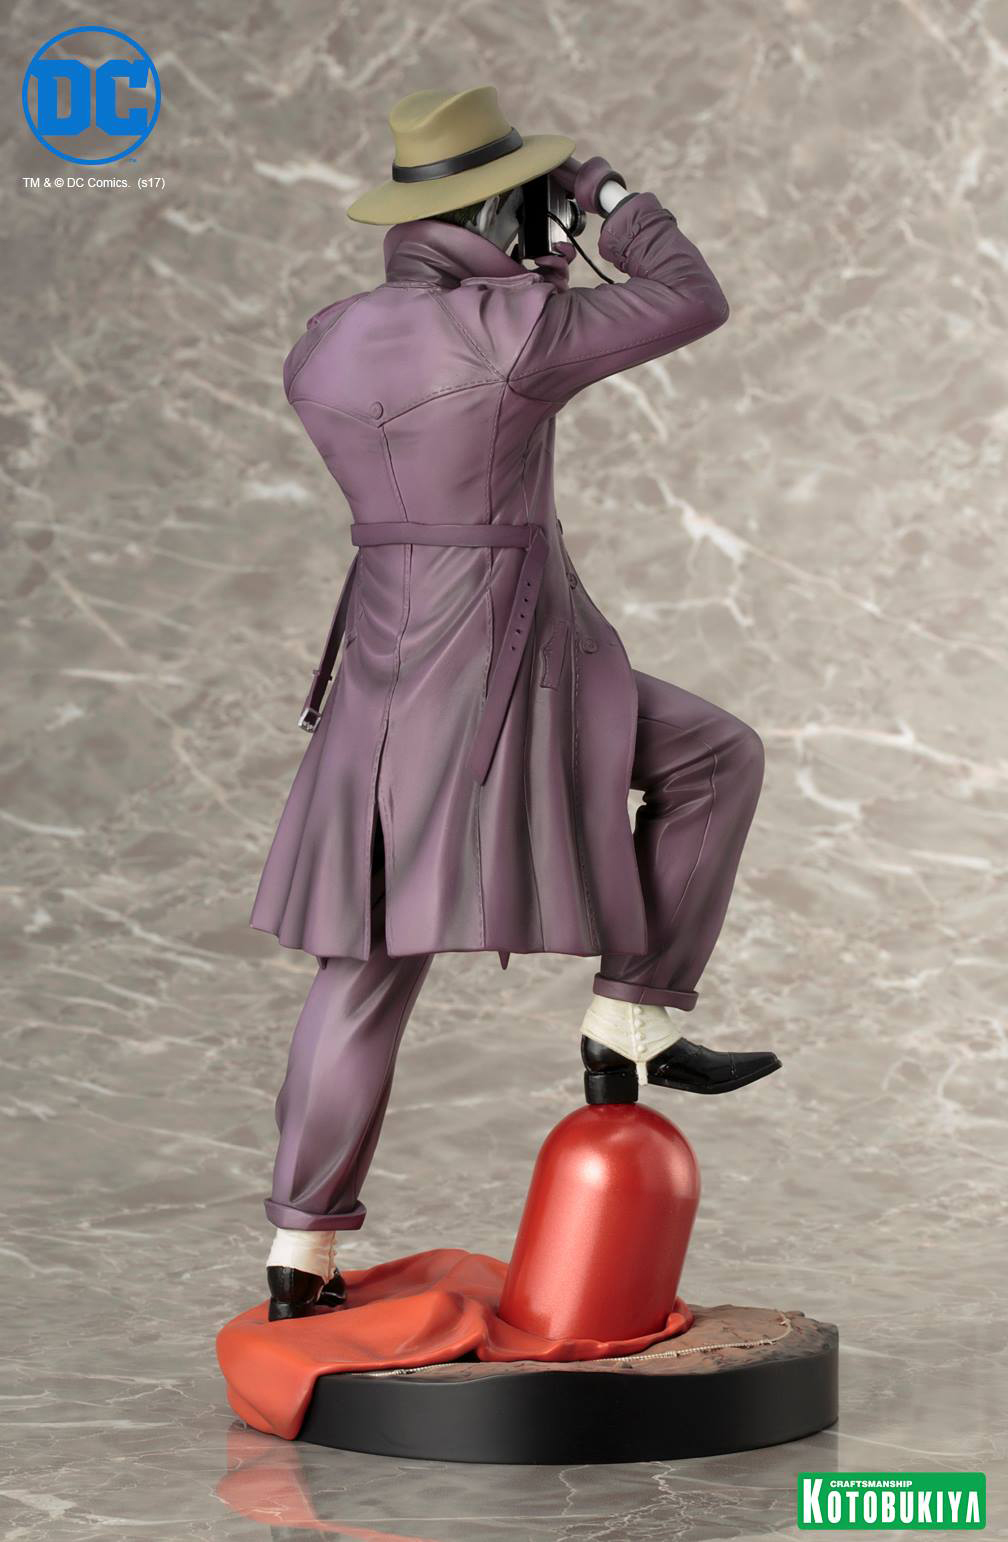 kotobukiya-joker-the-killing-joke-statue-4